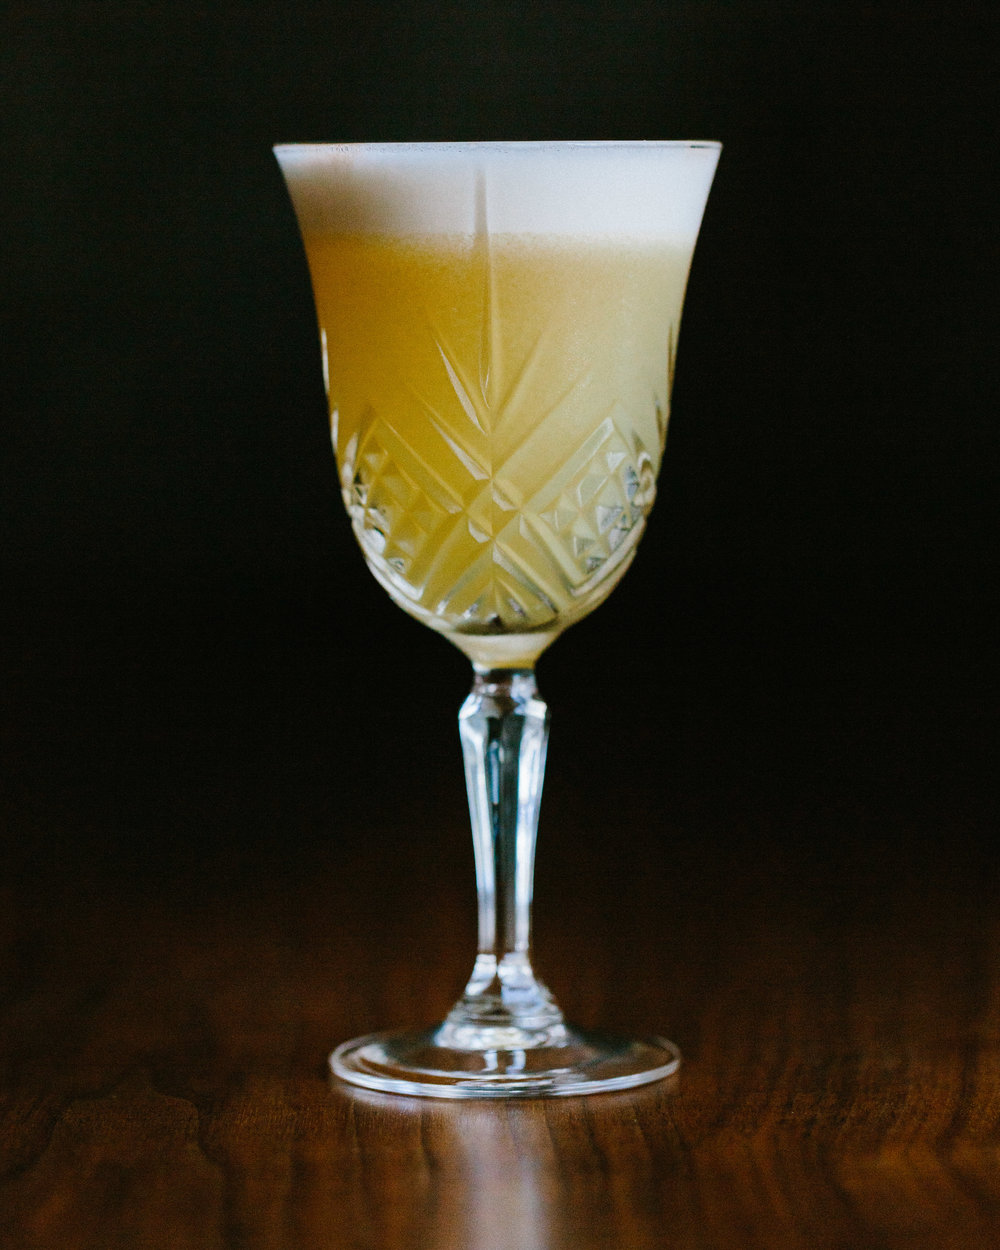 MMSF_CocktailFall16-4.jpg